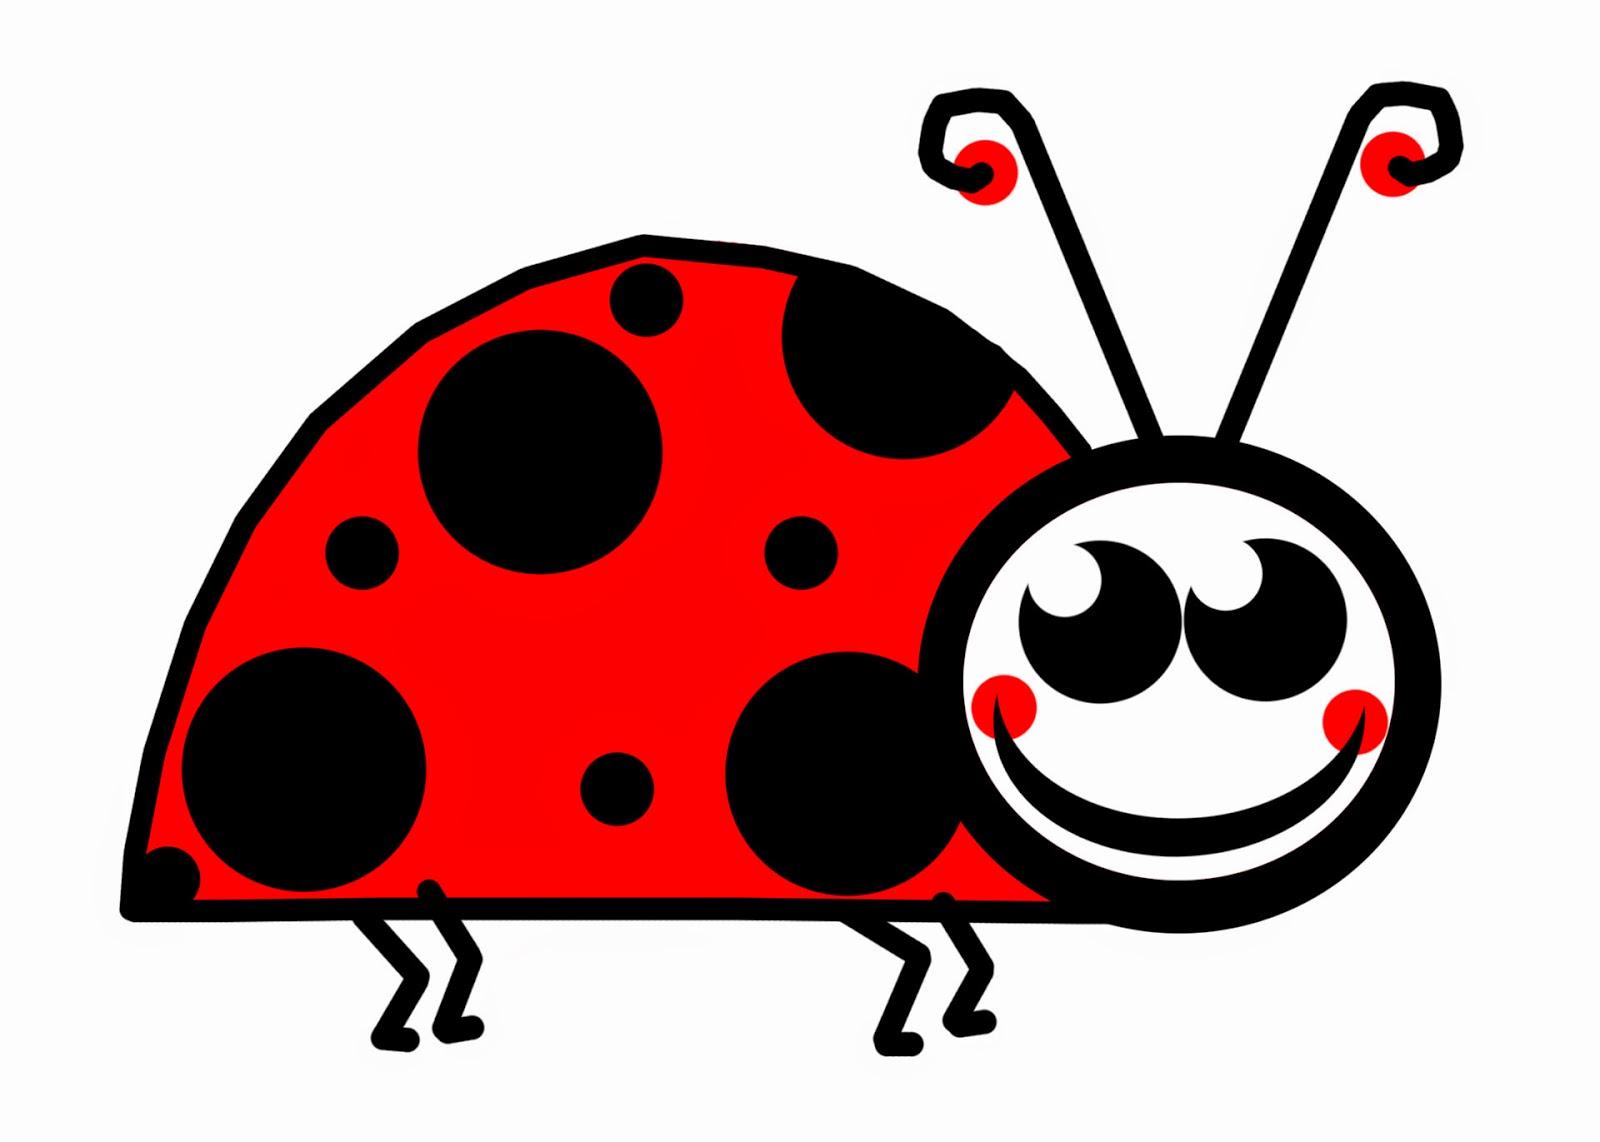 Lady Beetle clipart cute thing Or clipart (Clip PublicDomainPictures Bite?